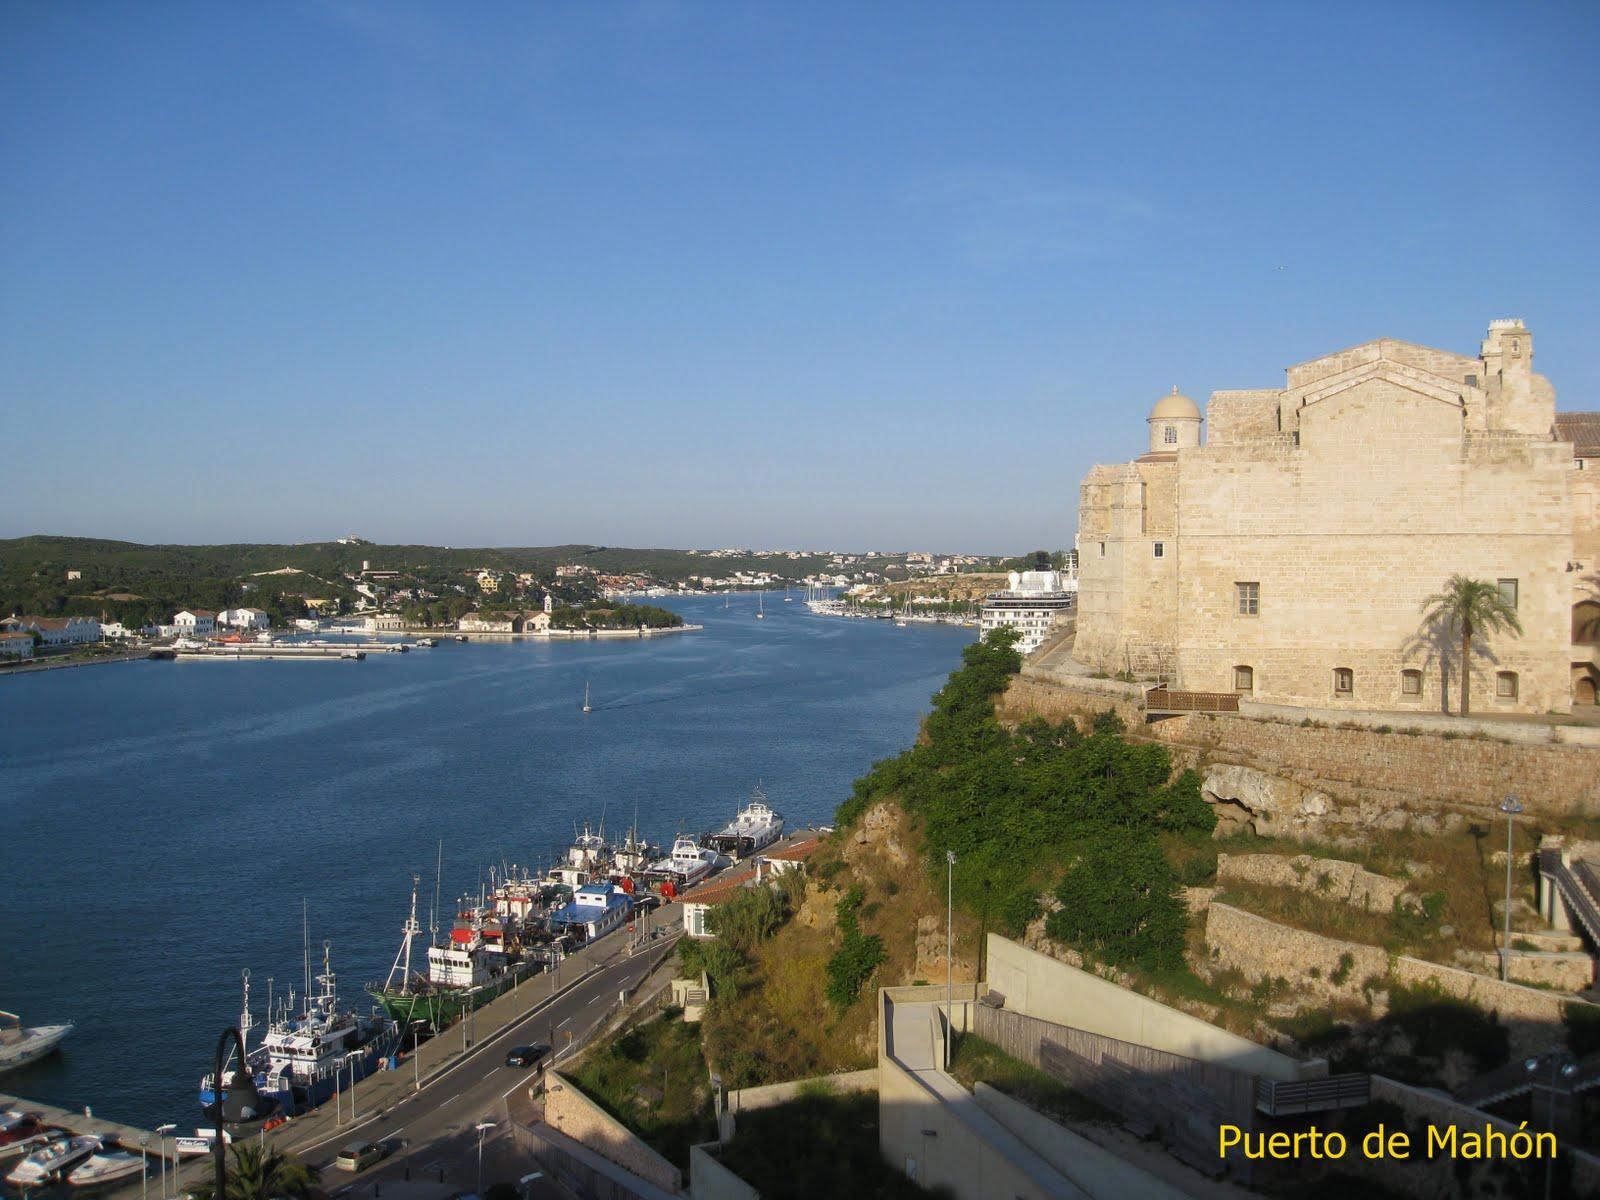 http://3.bp.blogspot.com/_OpvvSQ_4hiM/TC5J_tzI72I/AAAAAAAABxI/FF4D6c_MSkU/s1600/Puerto+de+Mah%C3%B3n.jpg